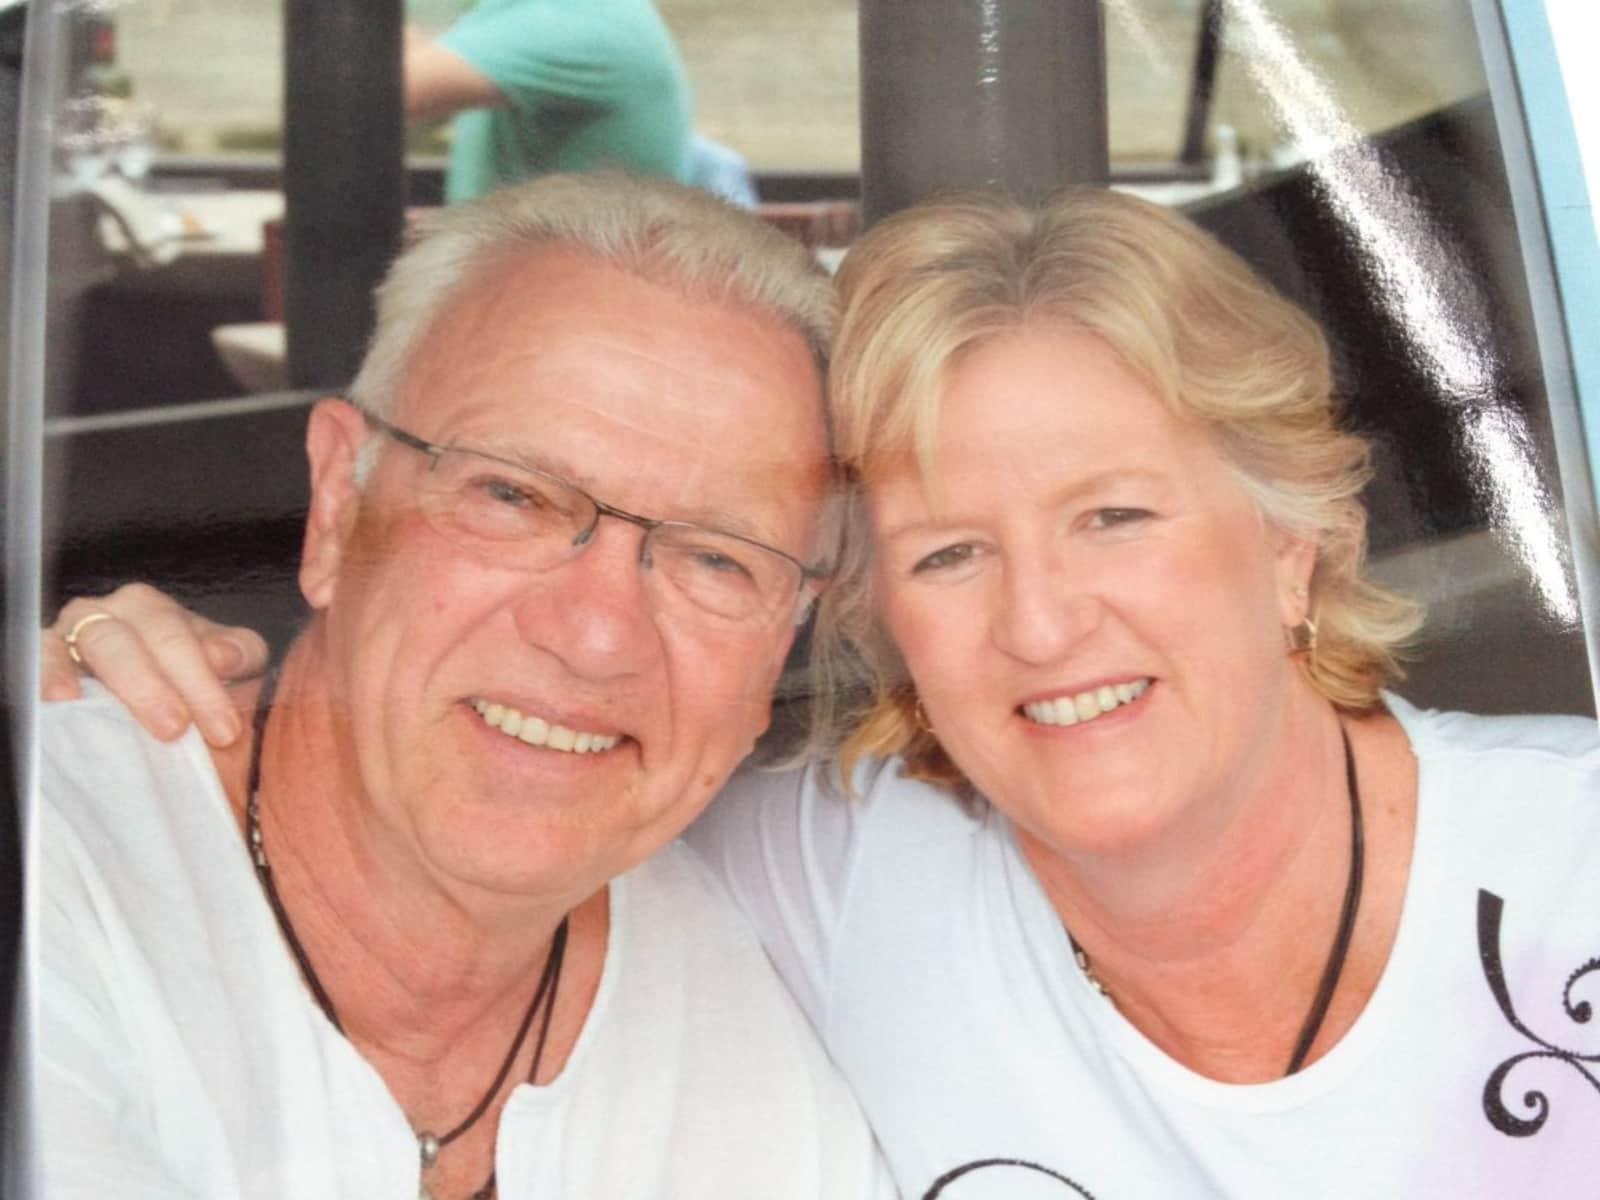 Cassie & Bill from Bunbury, Western Australia, Australia